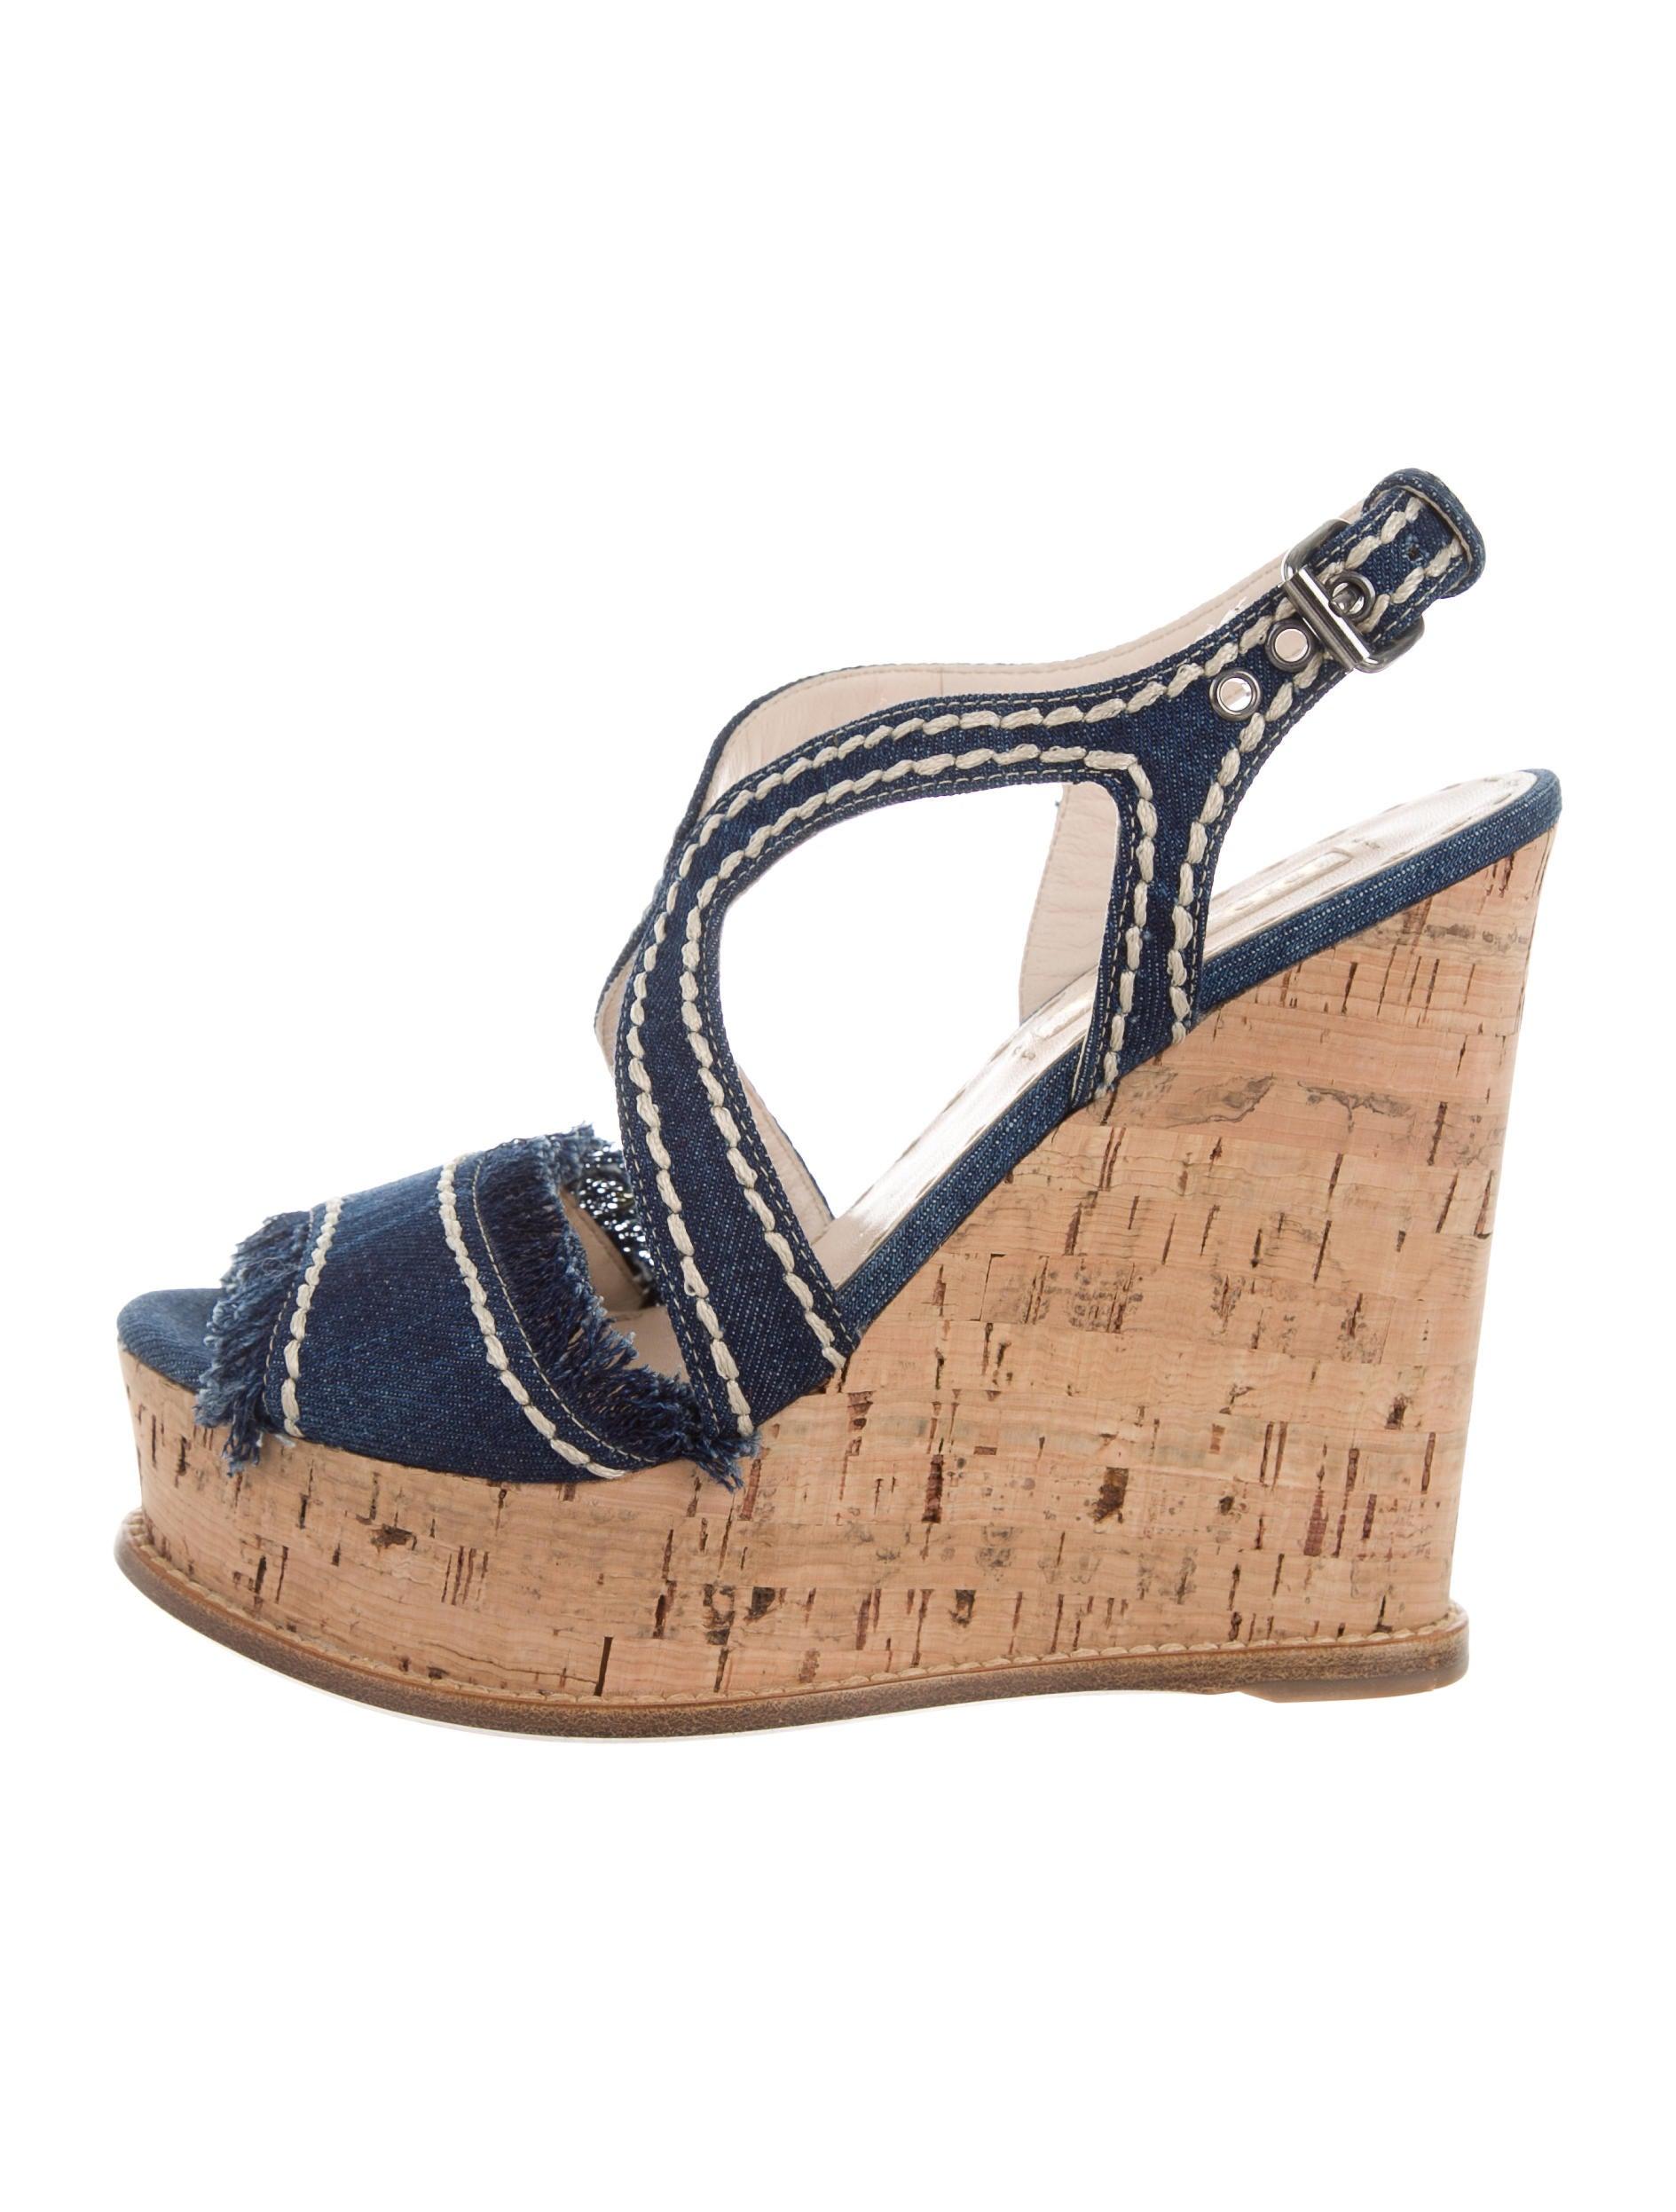 prada denim wedge sandals shoes pra139694 the realreal